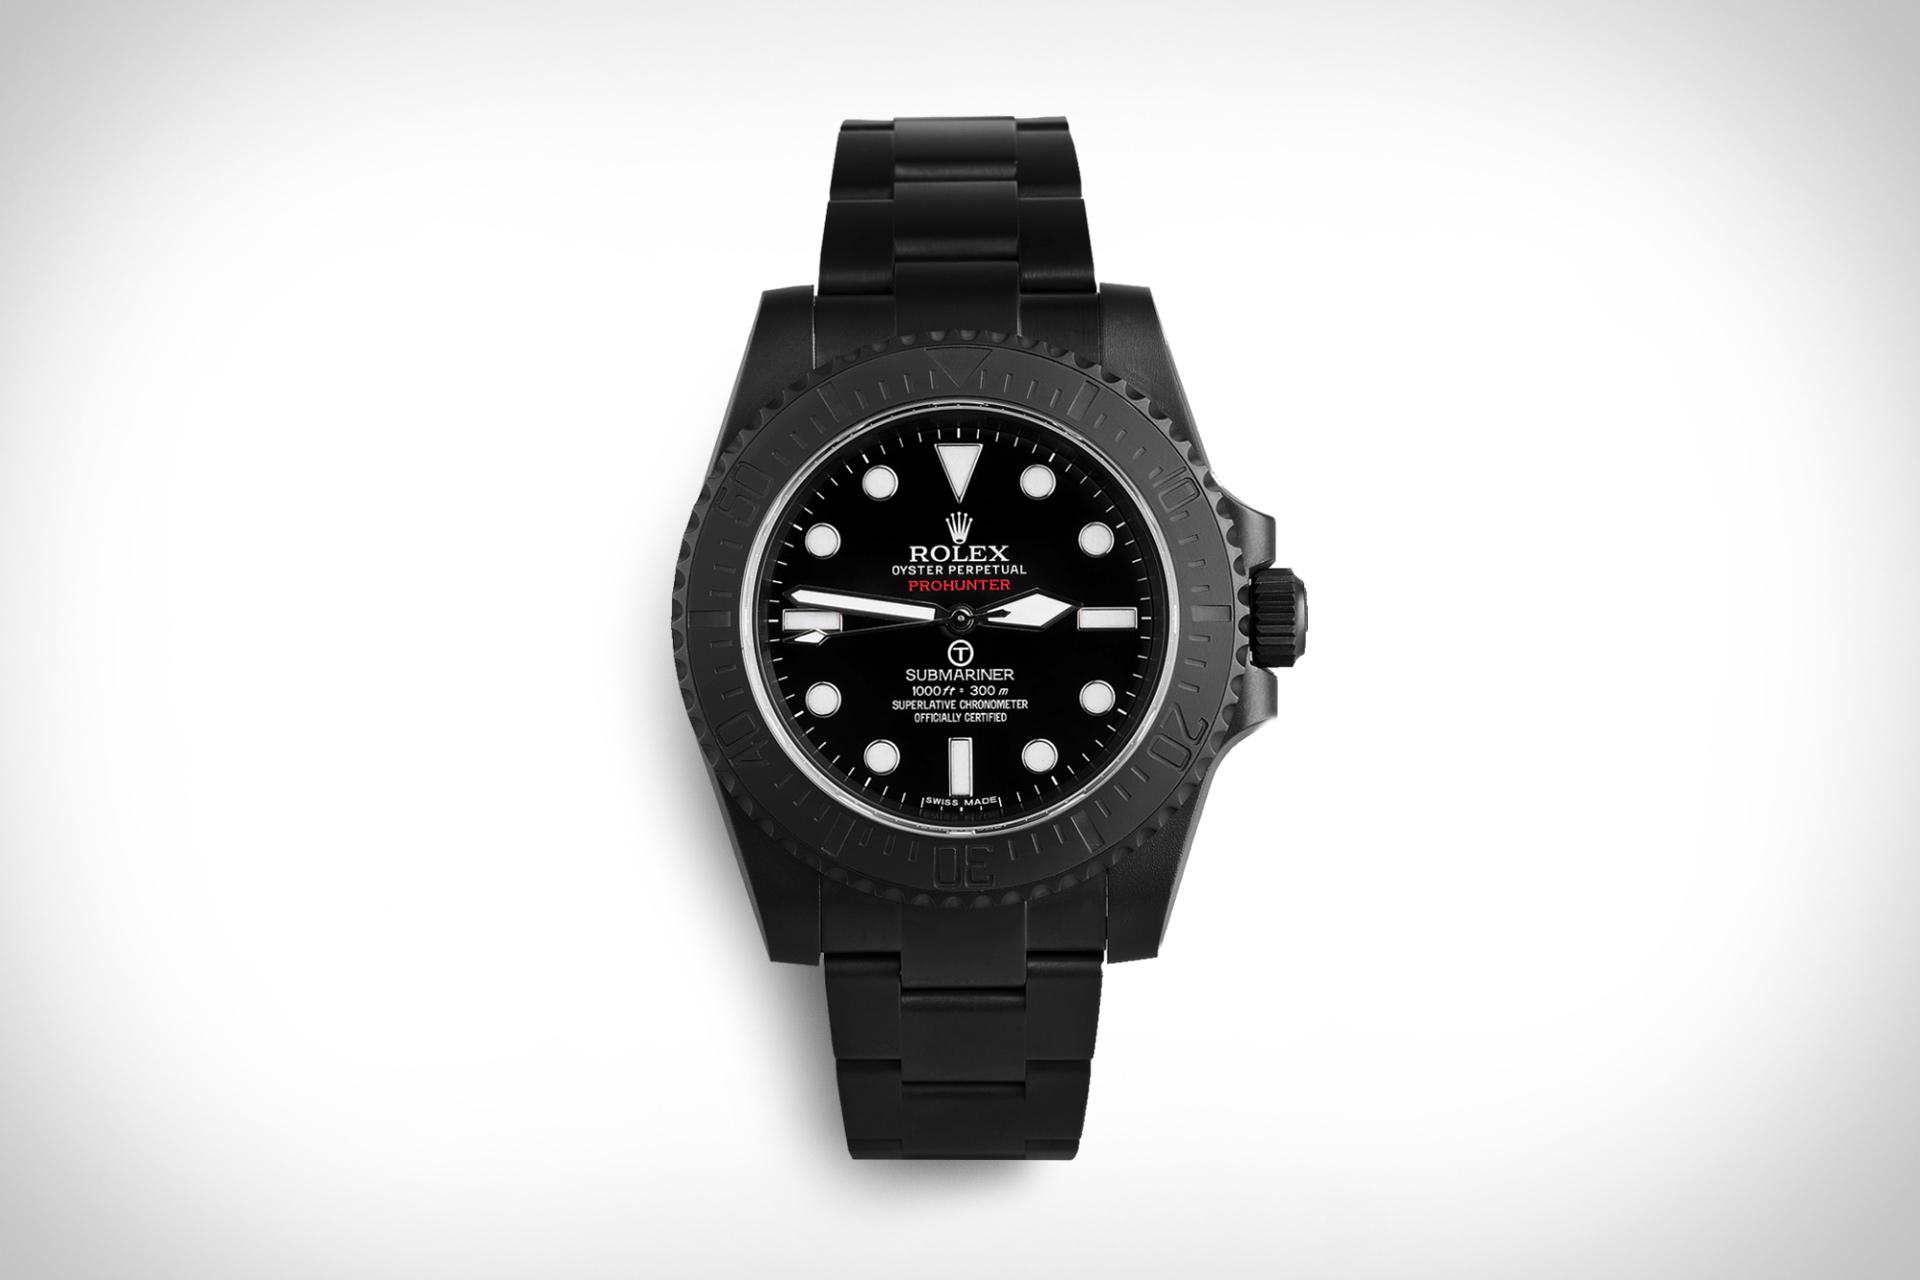 Pro Hunter Rolex Submariner Military Stealth Watch